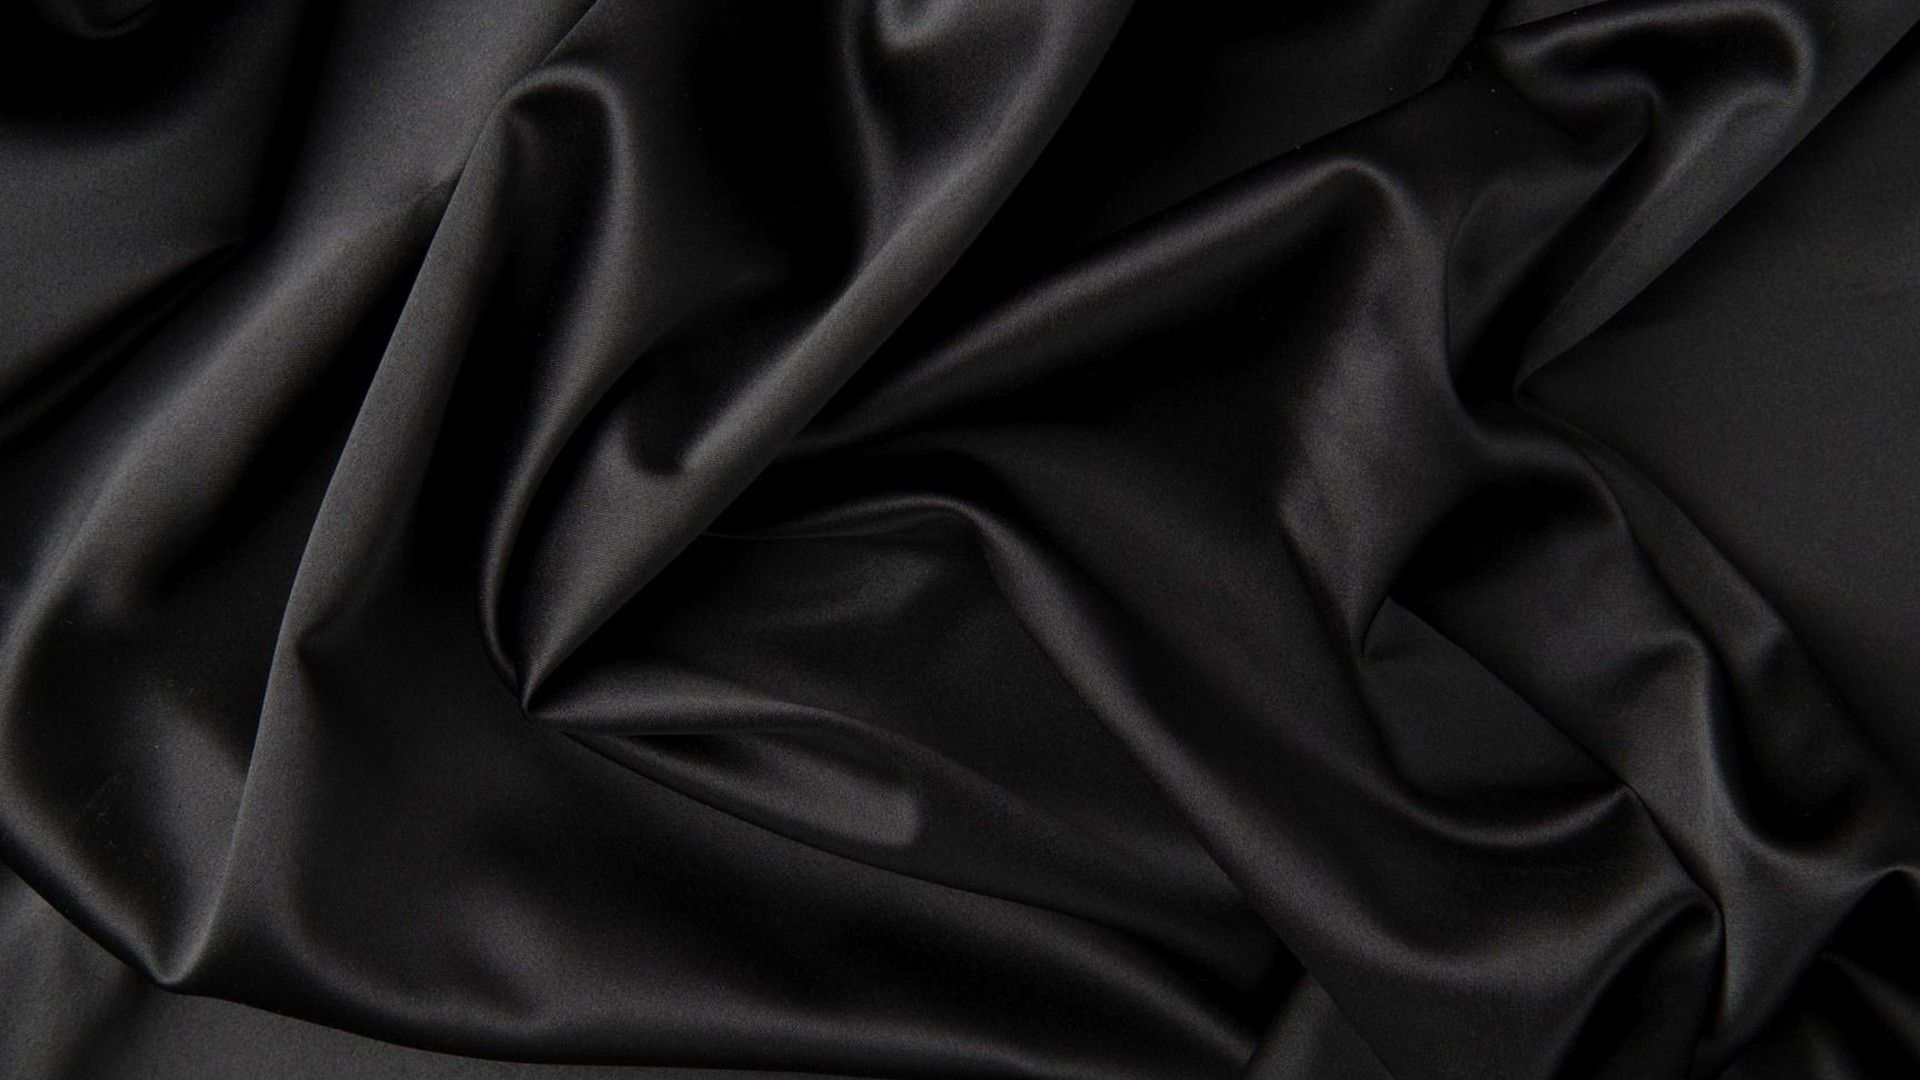 Black Silk Background Wallpaper Hd 2021 Live Wallpaper Hd Wallpaper Best Wallpaper Hd Live Wallpapers